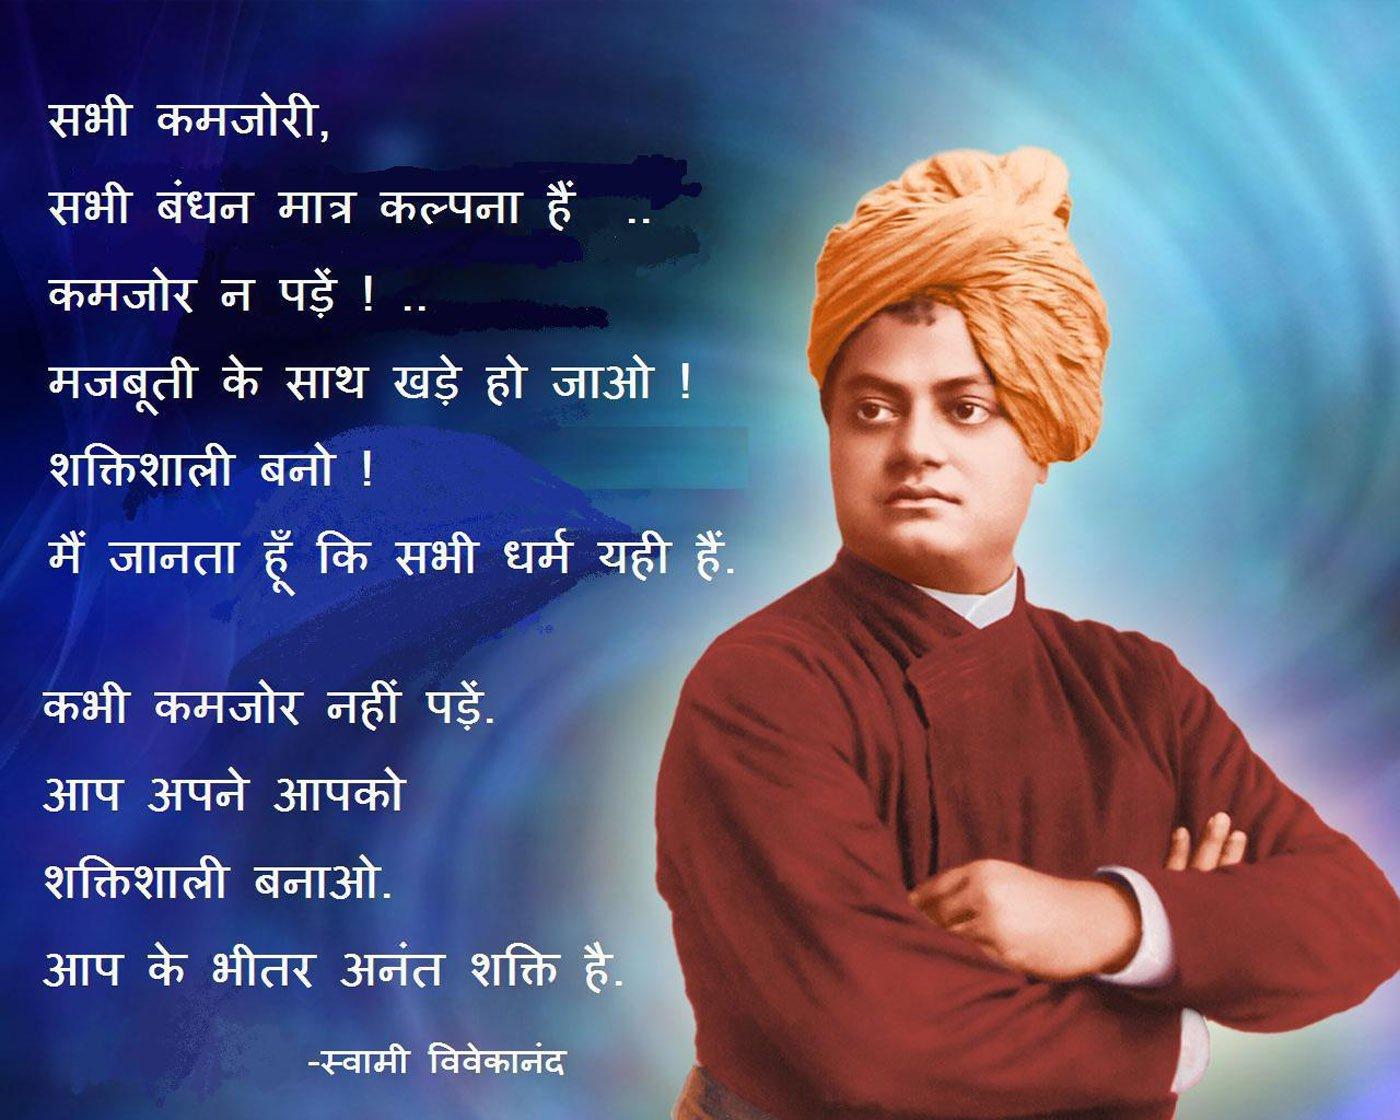 Swami Vivekananda Quotes Wallpaper 12416   Baltana 1400x1120